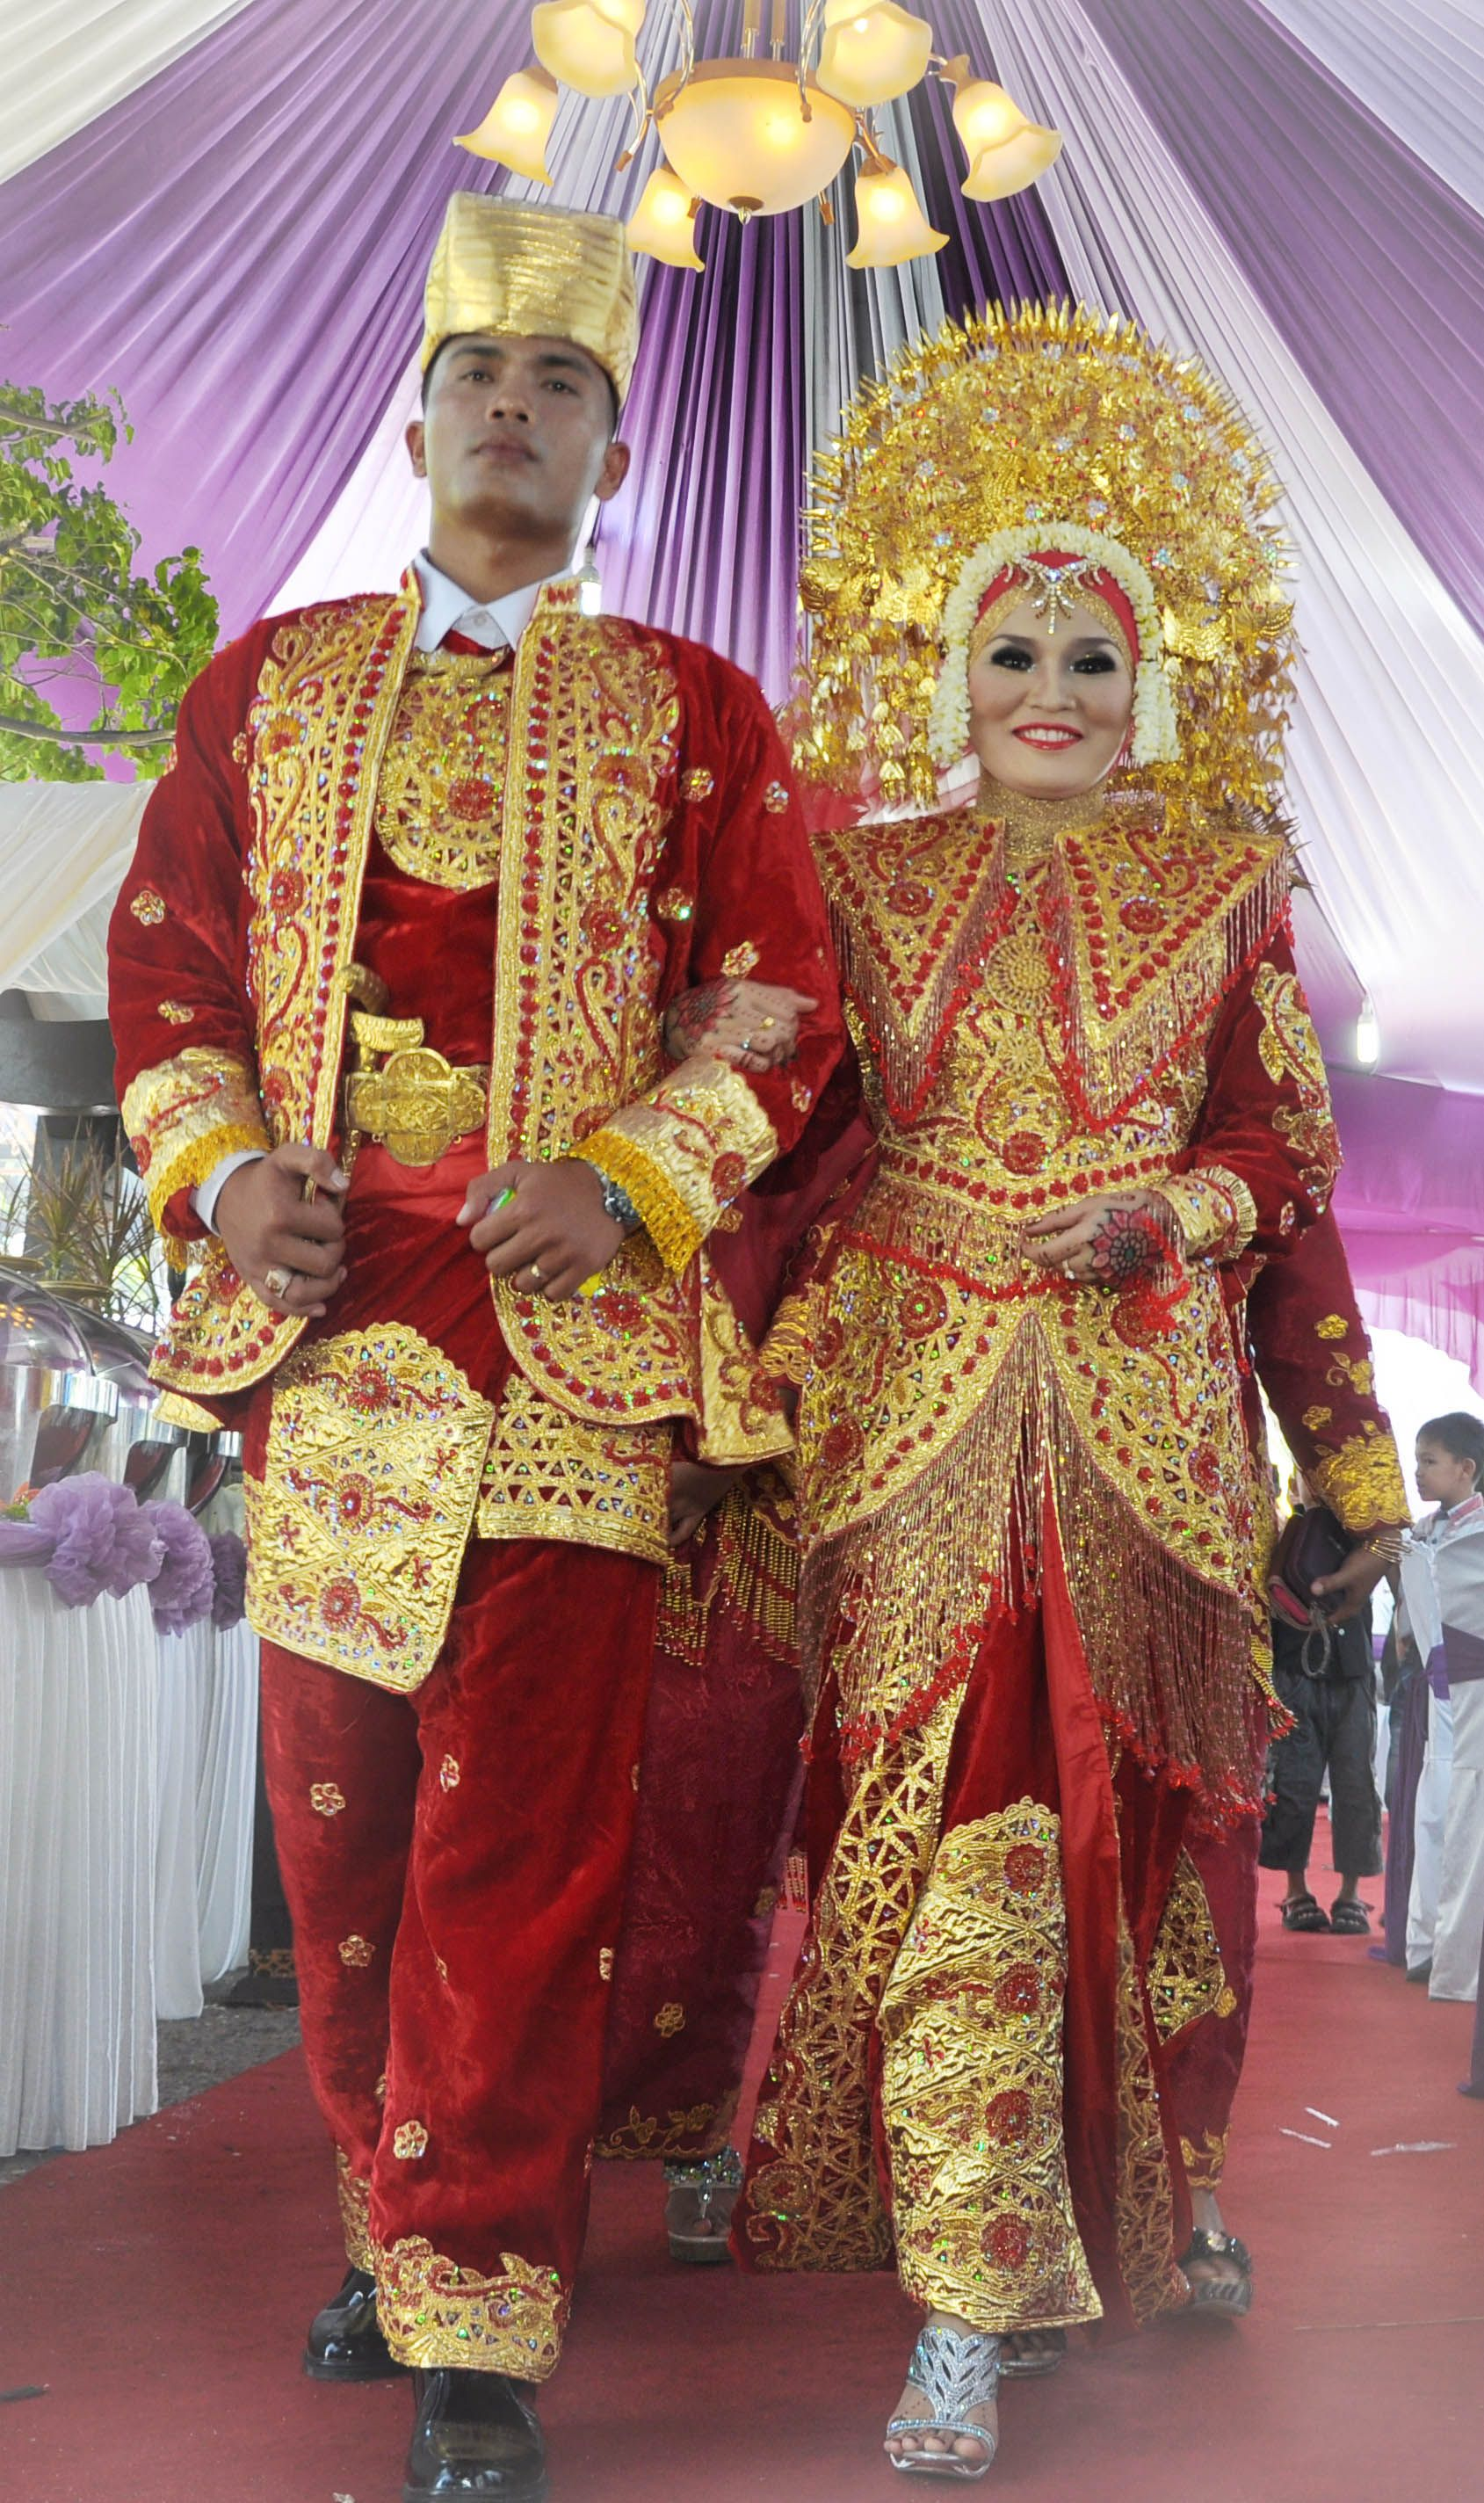 Pakaian Adat Tradisional Sumatera Barat